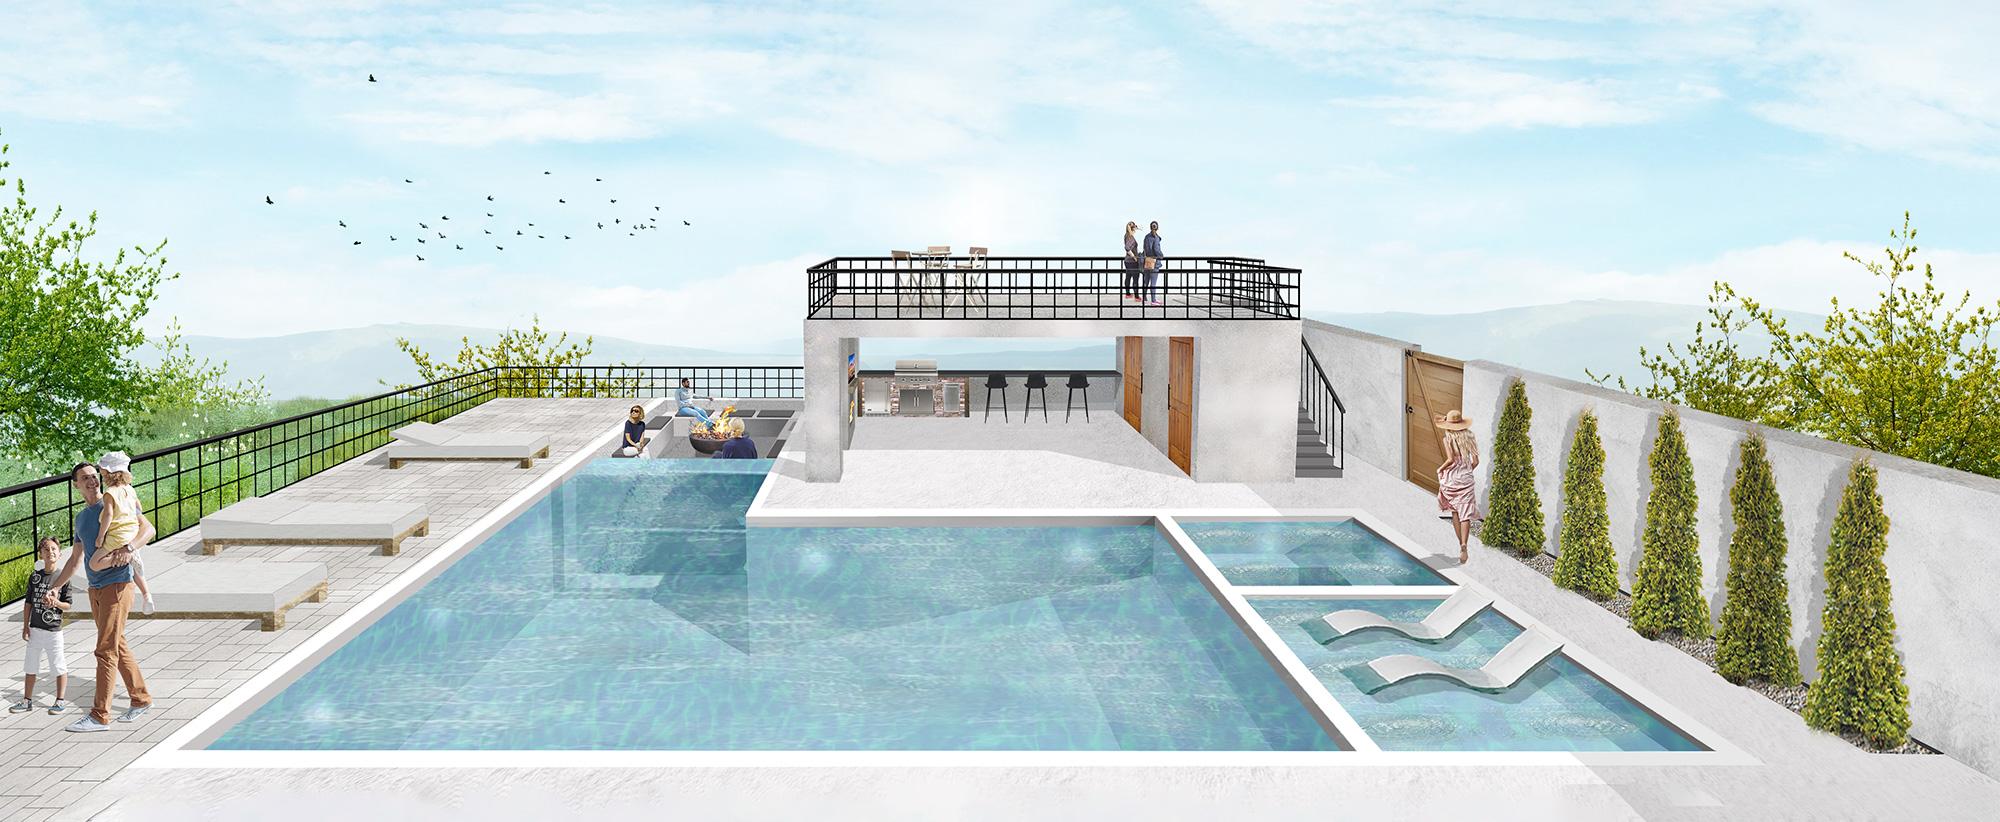 Mission Heights Pool